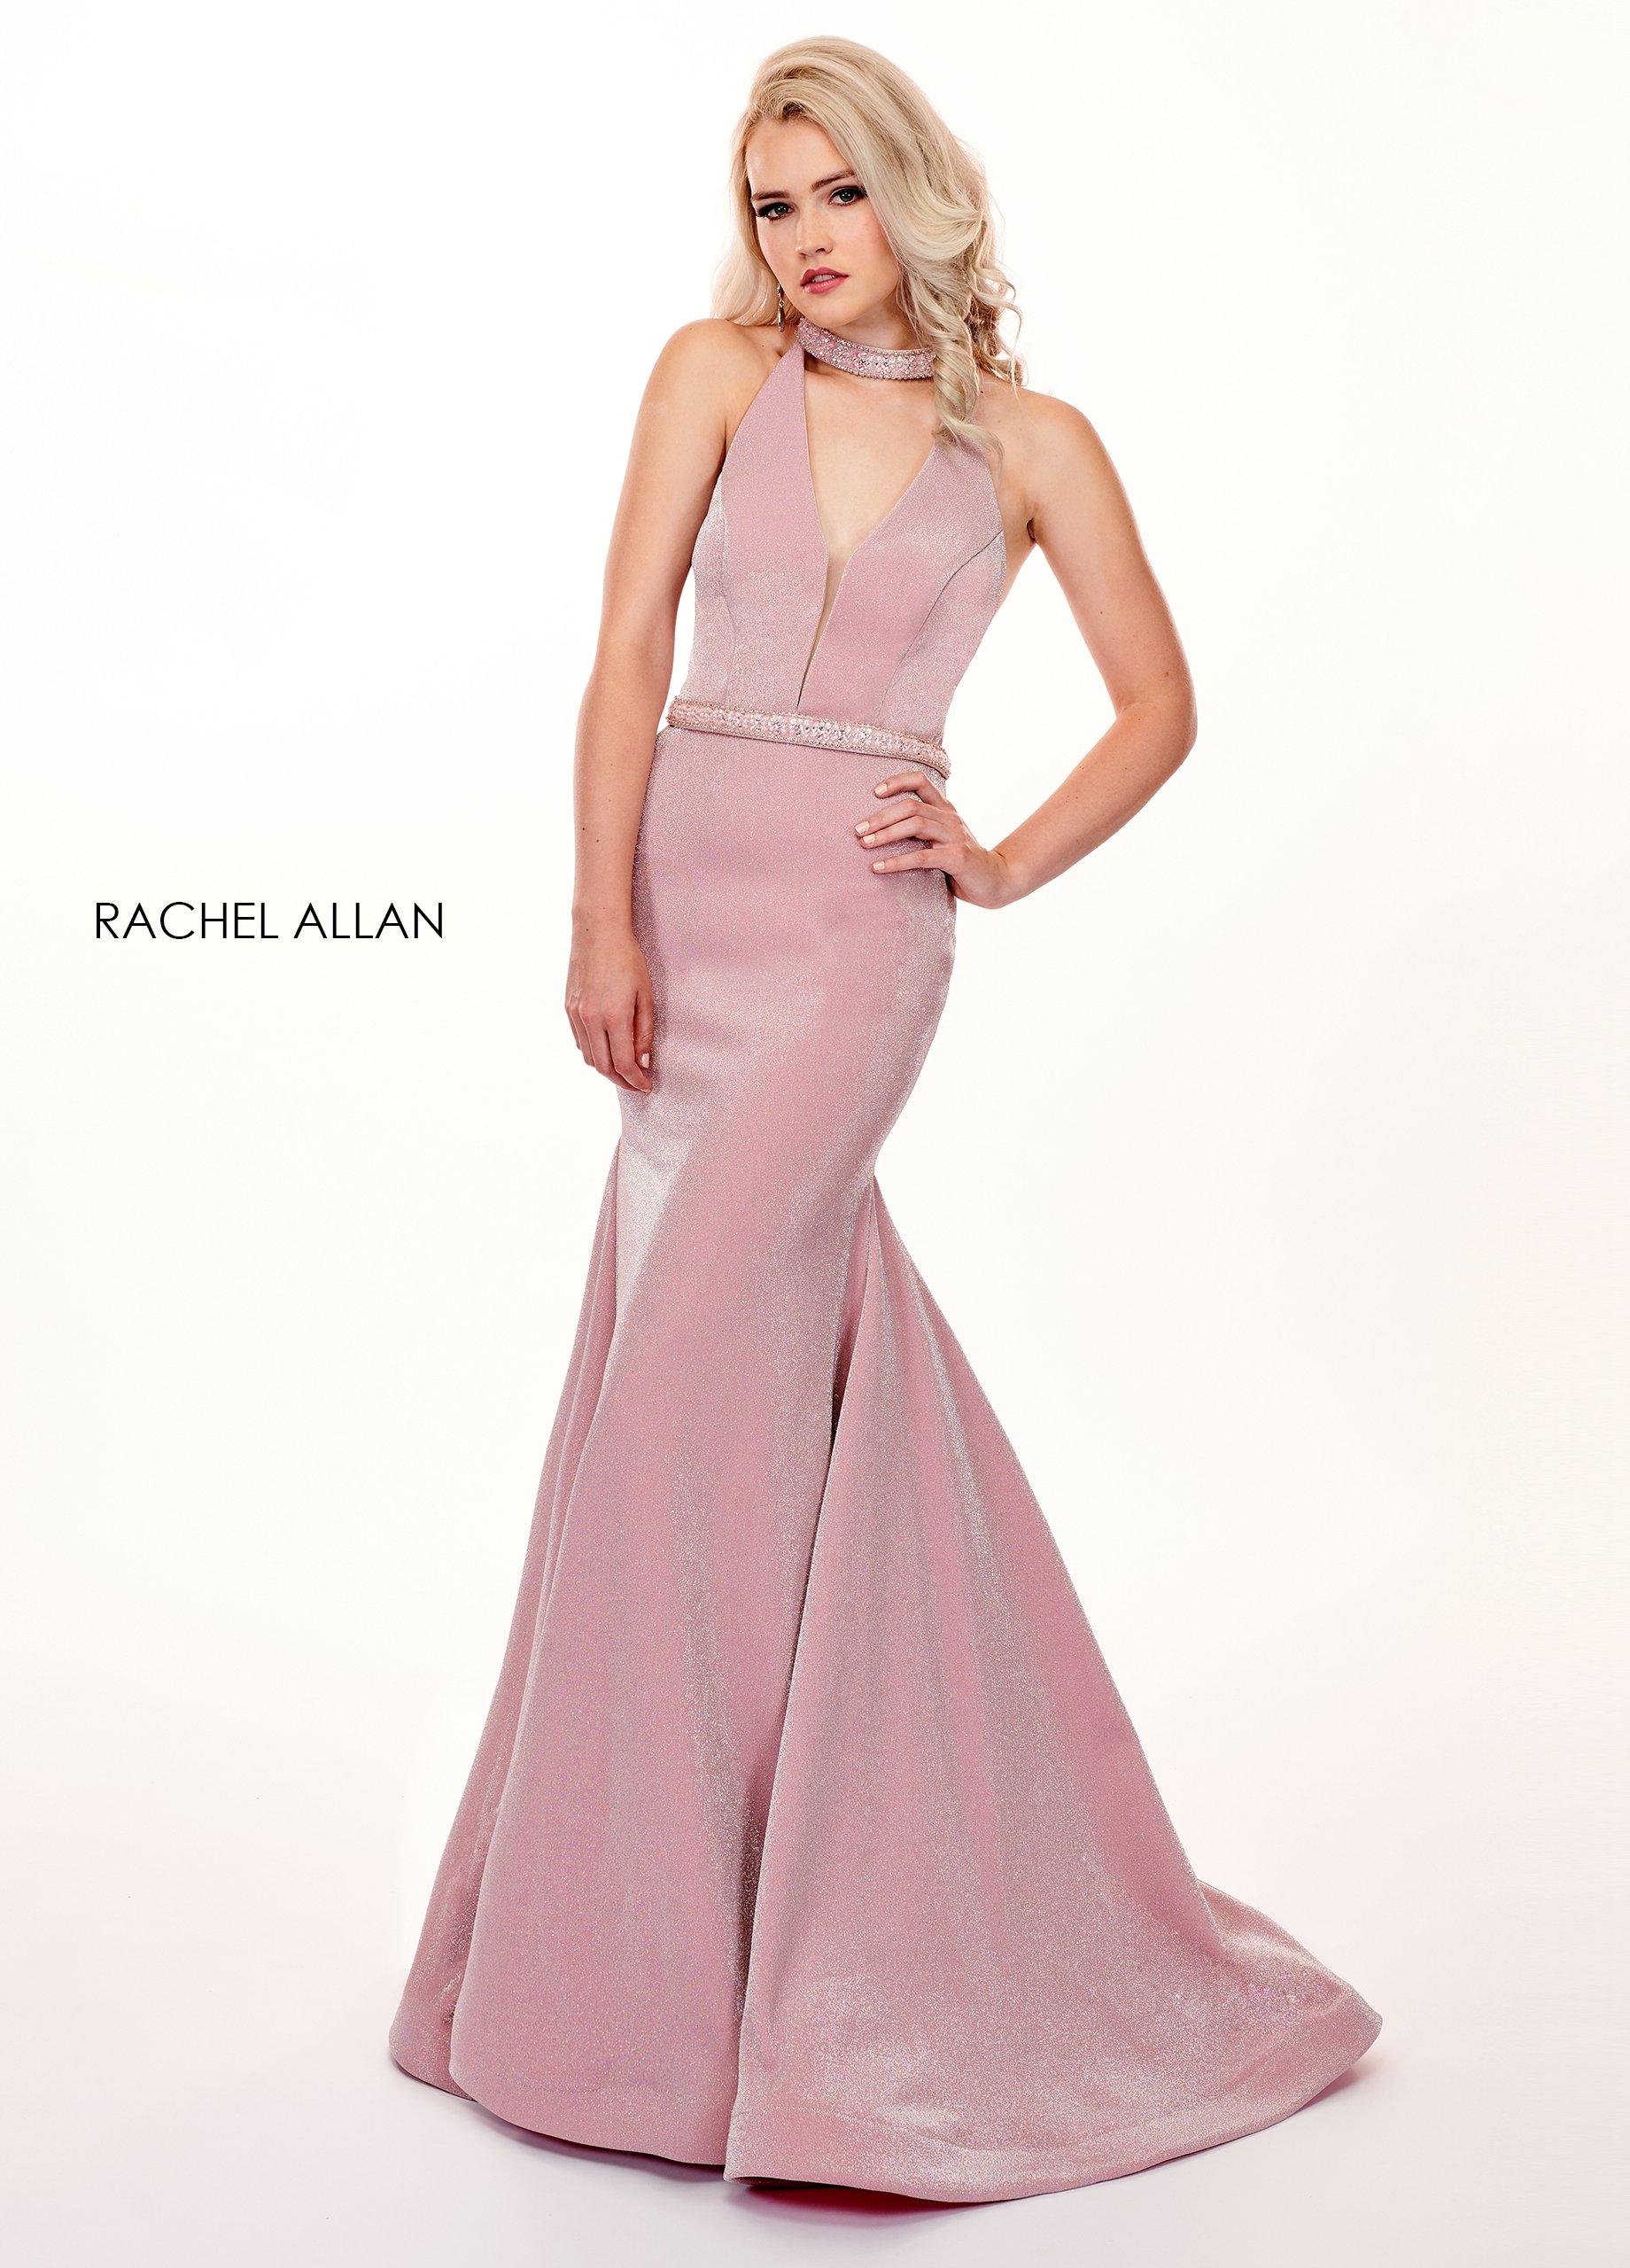 Rachel Allan - 6436 Beaded High Halter Metallic Jersey Mermaid Dress